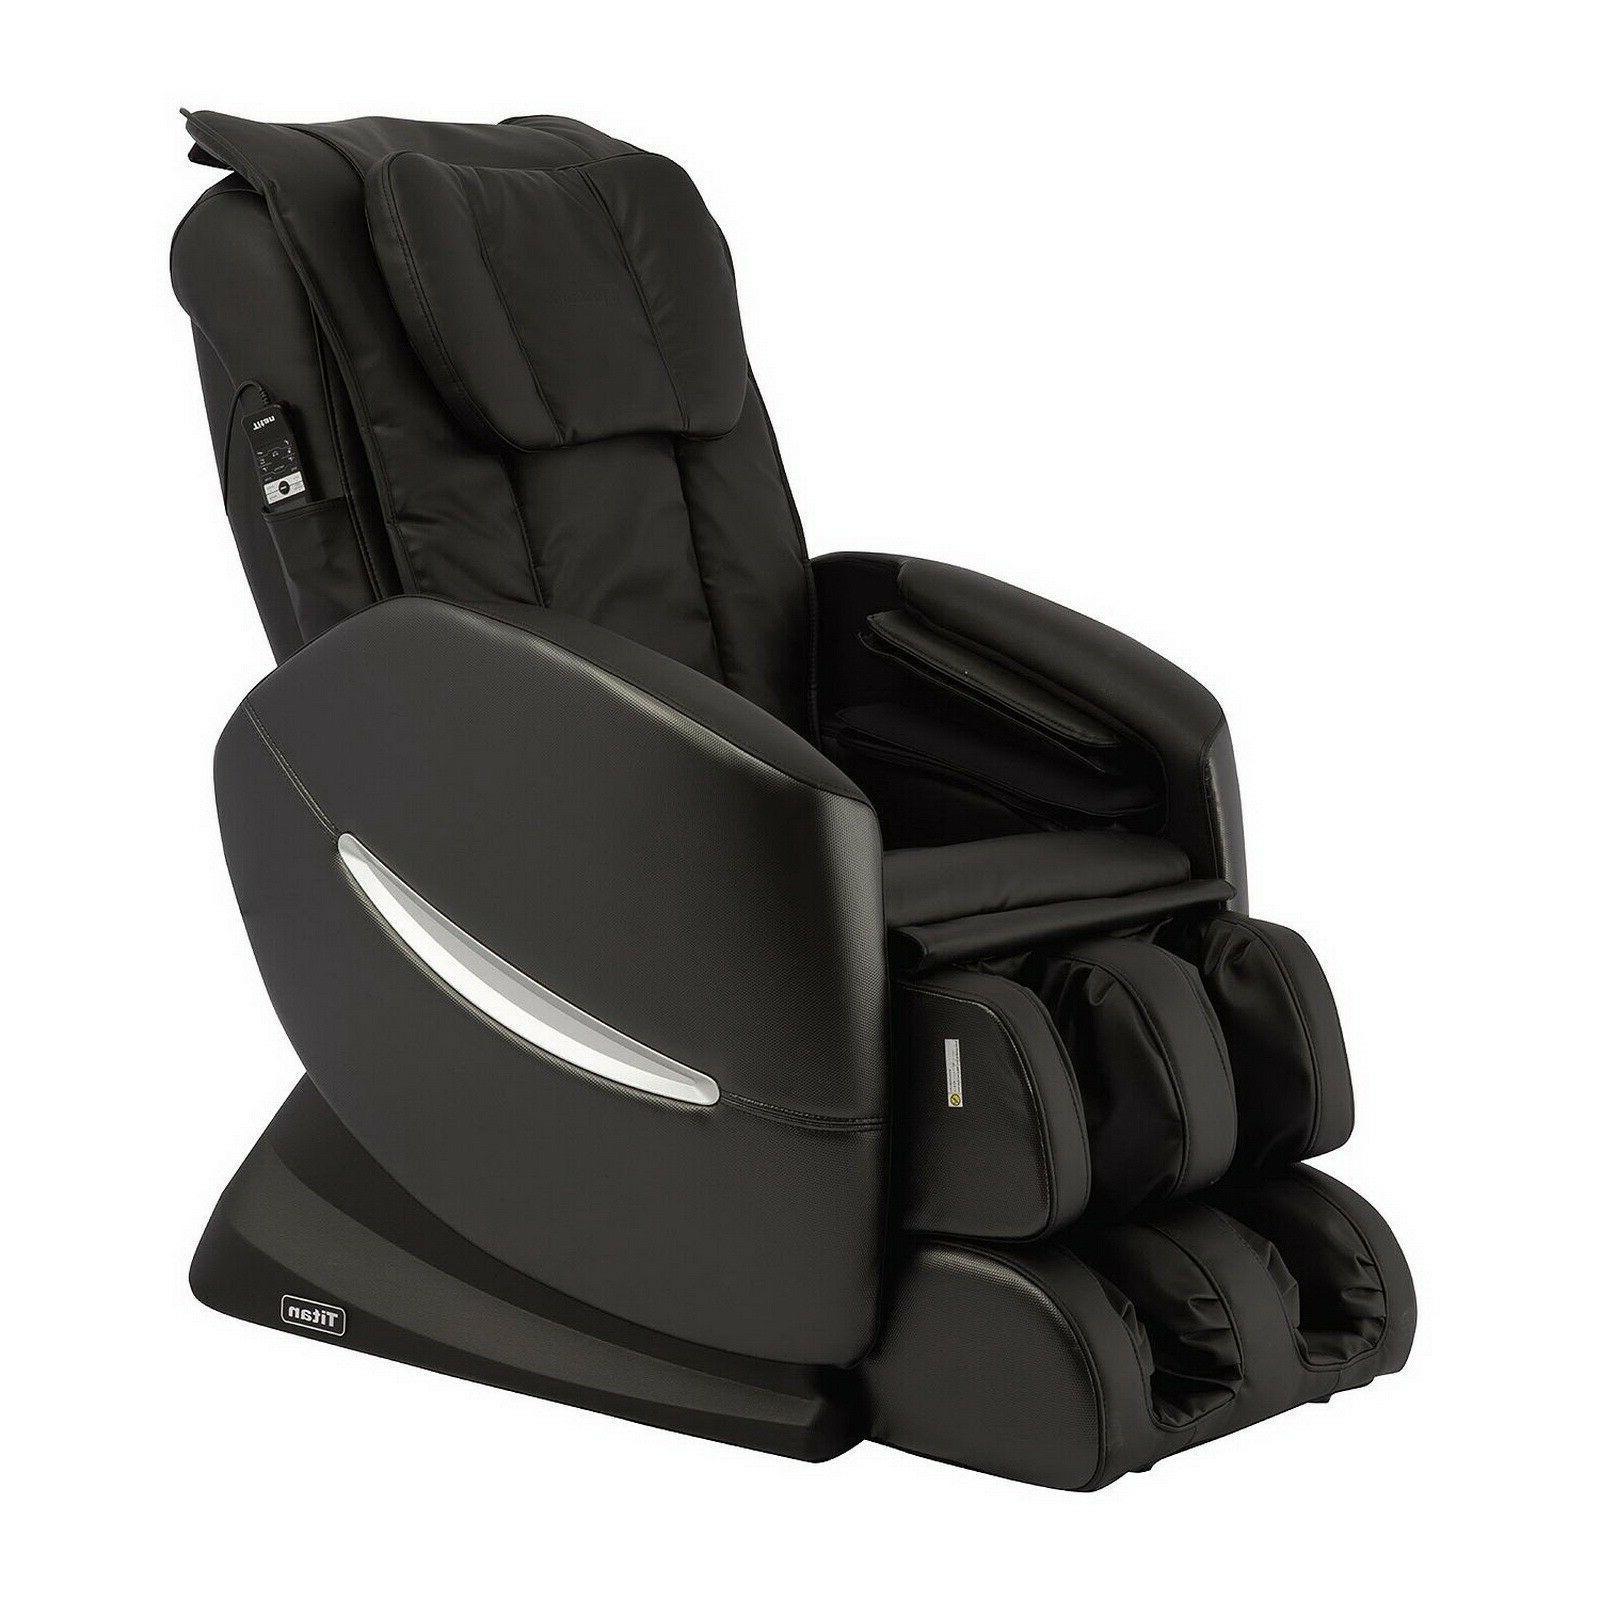 massage chair full body back massage comfort